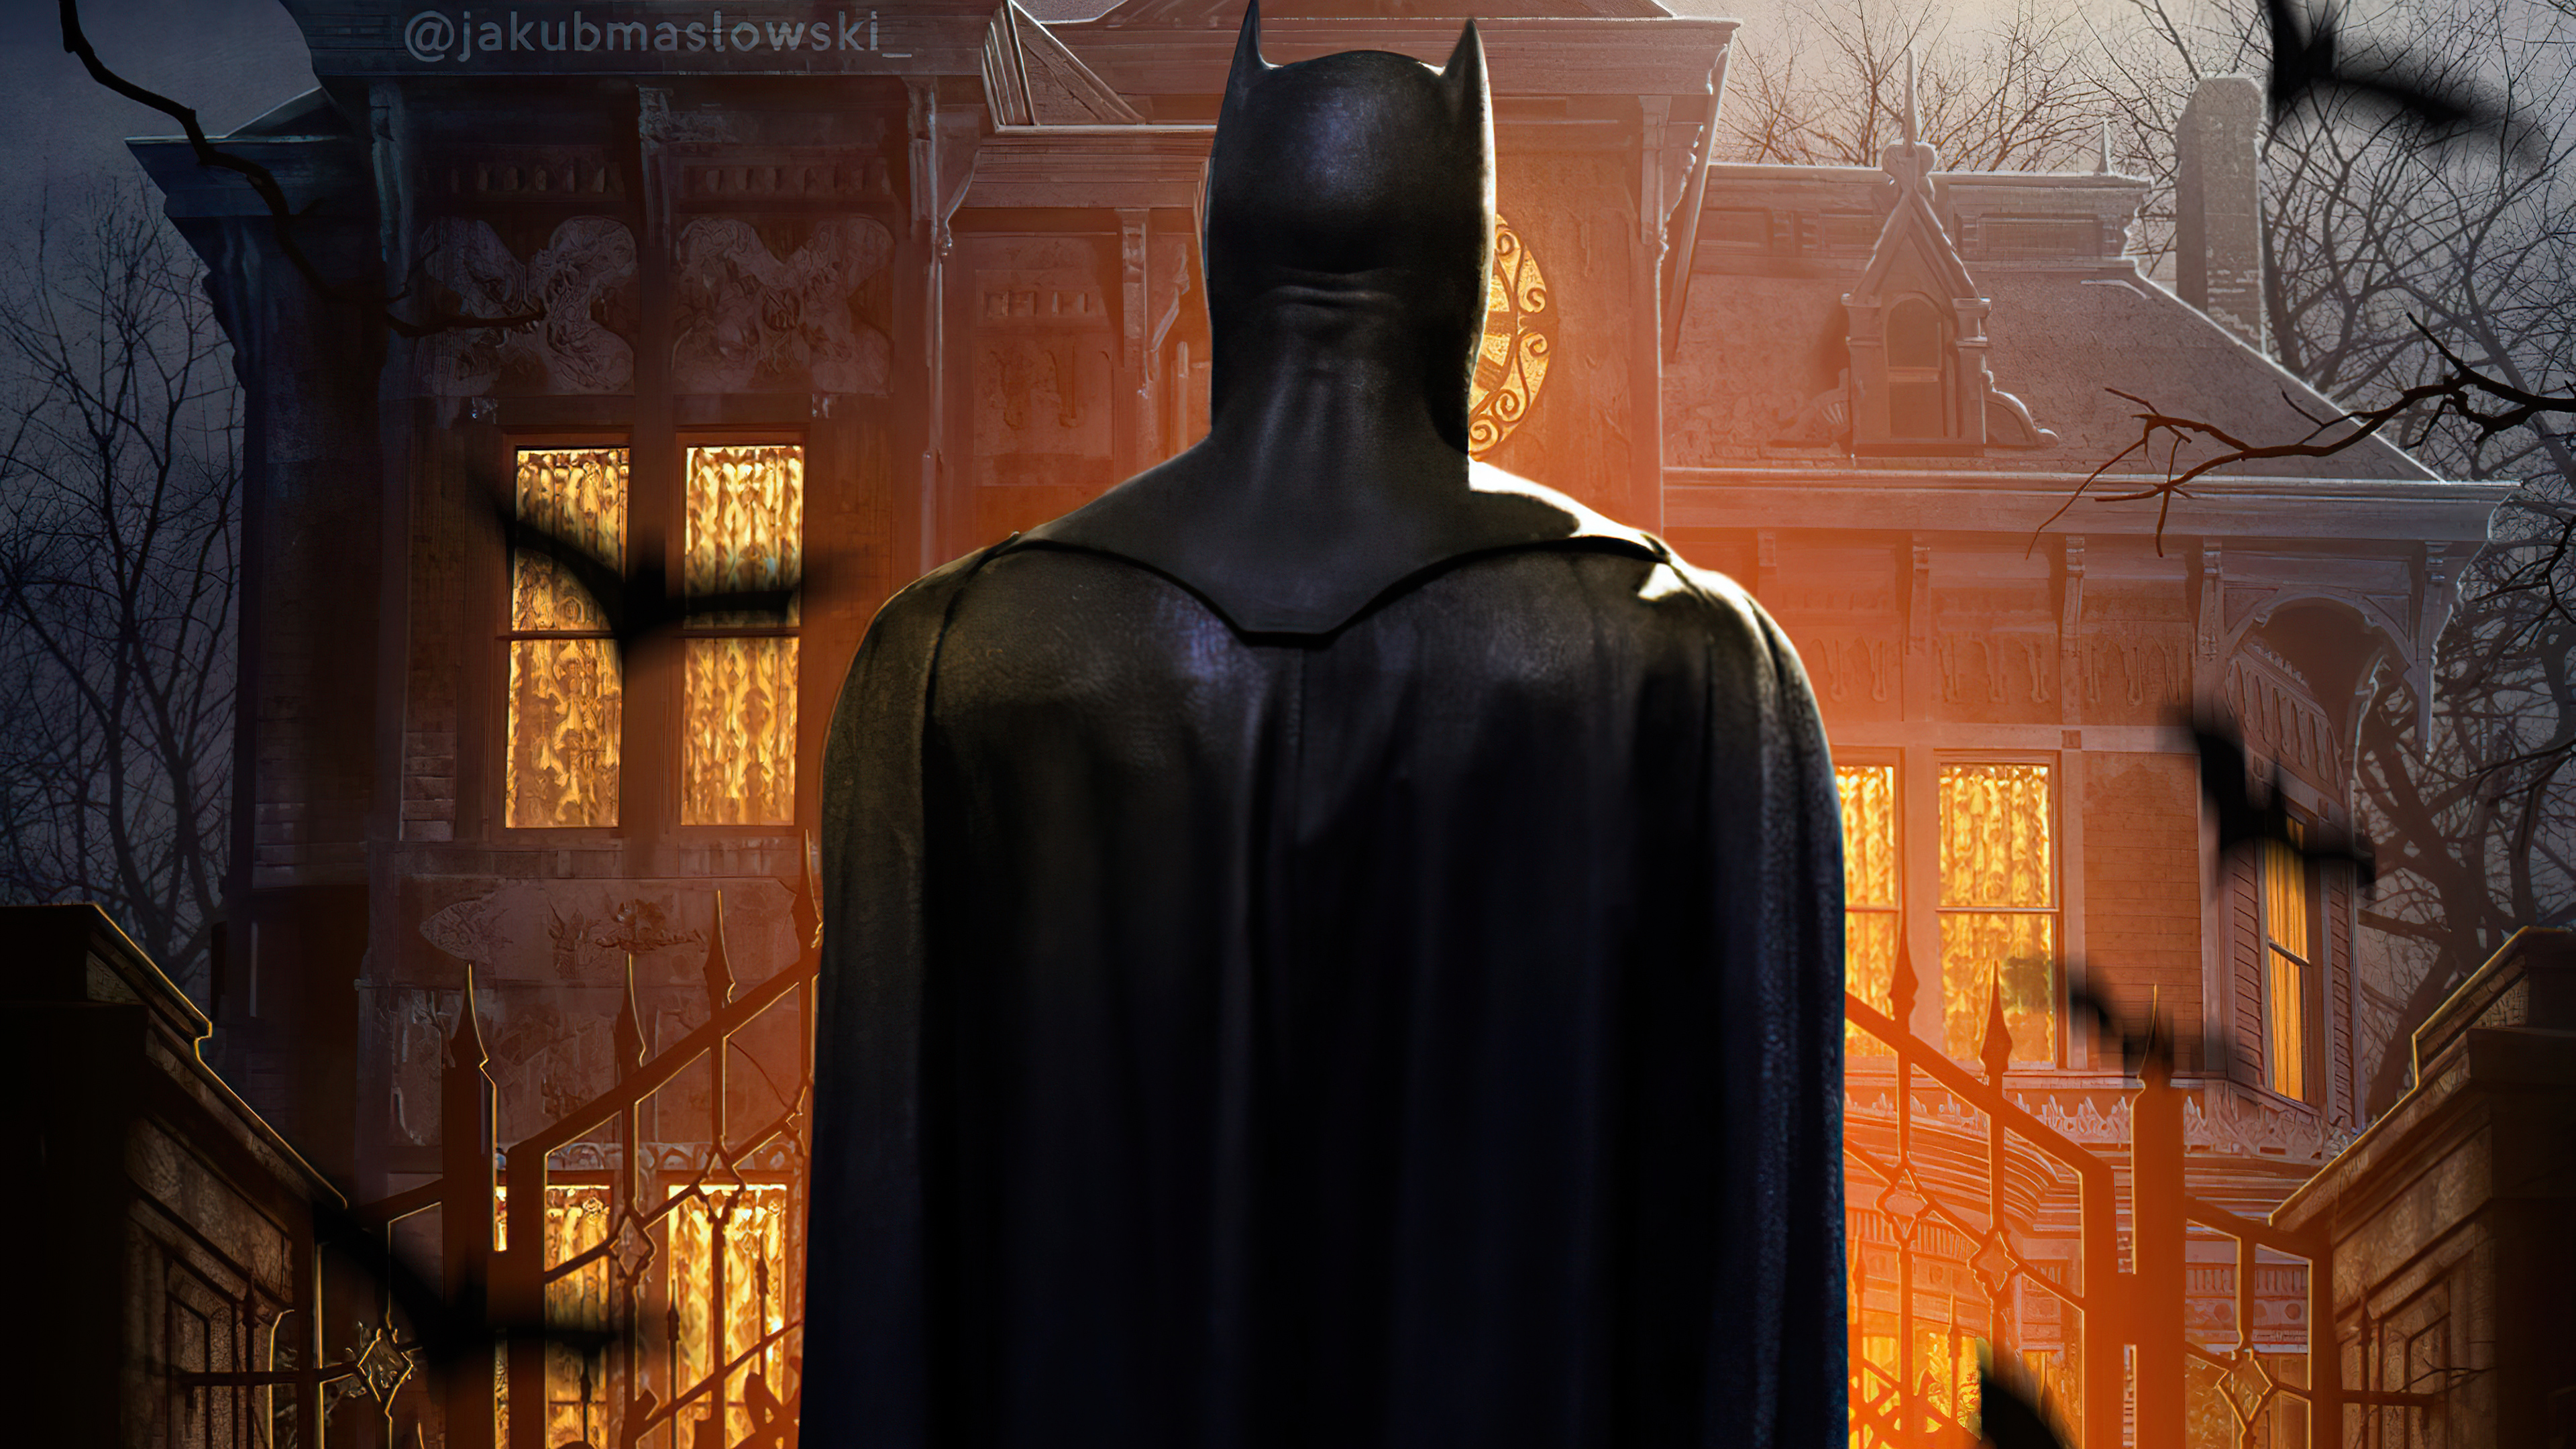 batman the worlds greatest detective 4k 1619215238 - Batman The Worlds Greatest Detective 4k - Batman The Worlds Greatest Detective 4k wallpapers